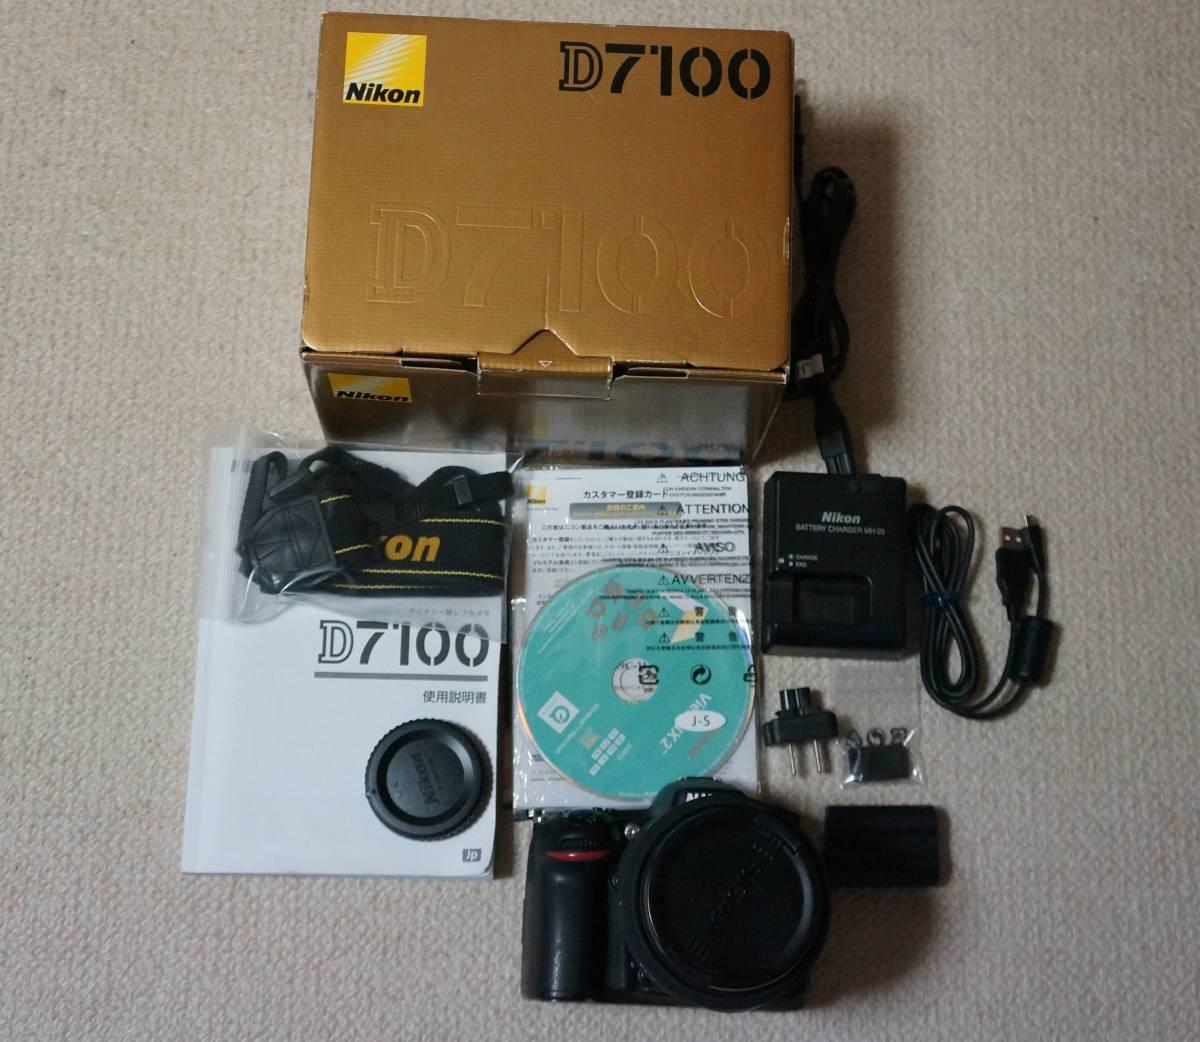 NIKON ニコン D7100 美品 総レリーズ回数3598回 機能正常 レンズ付き SIGMA DC 17-70mm F2.8-4.5 デジタル一眼レフ